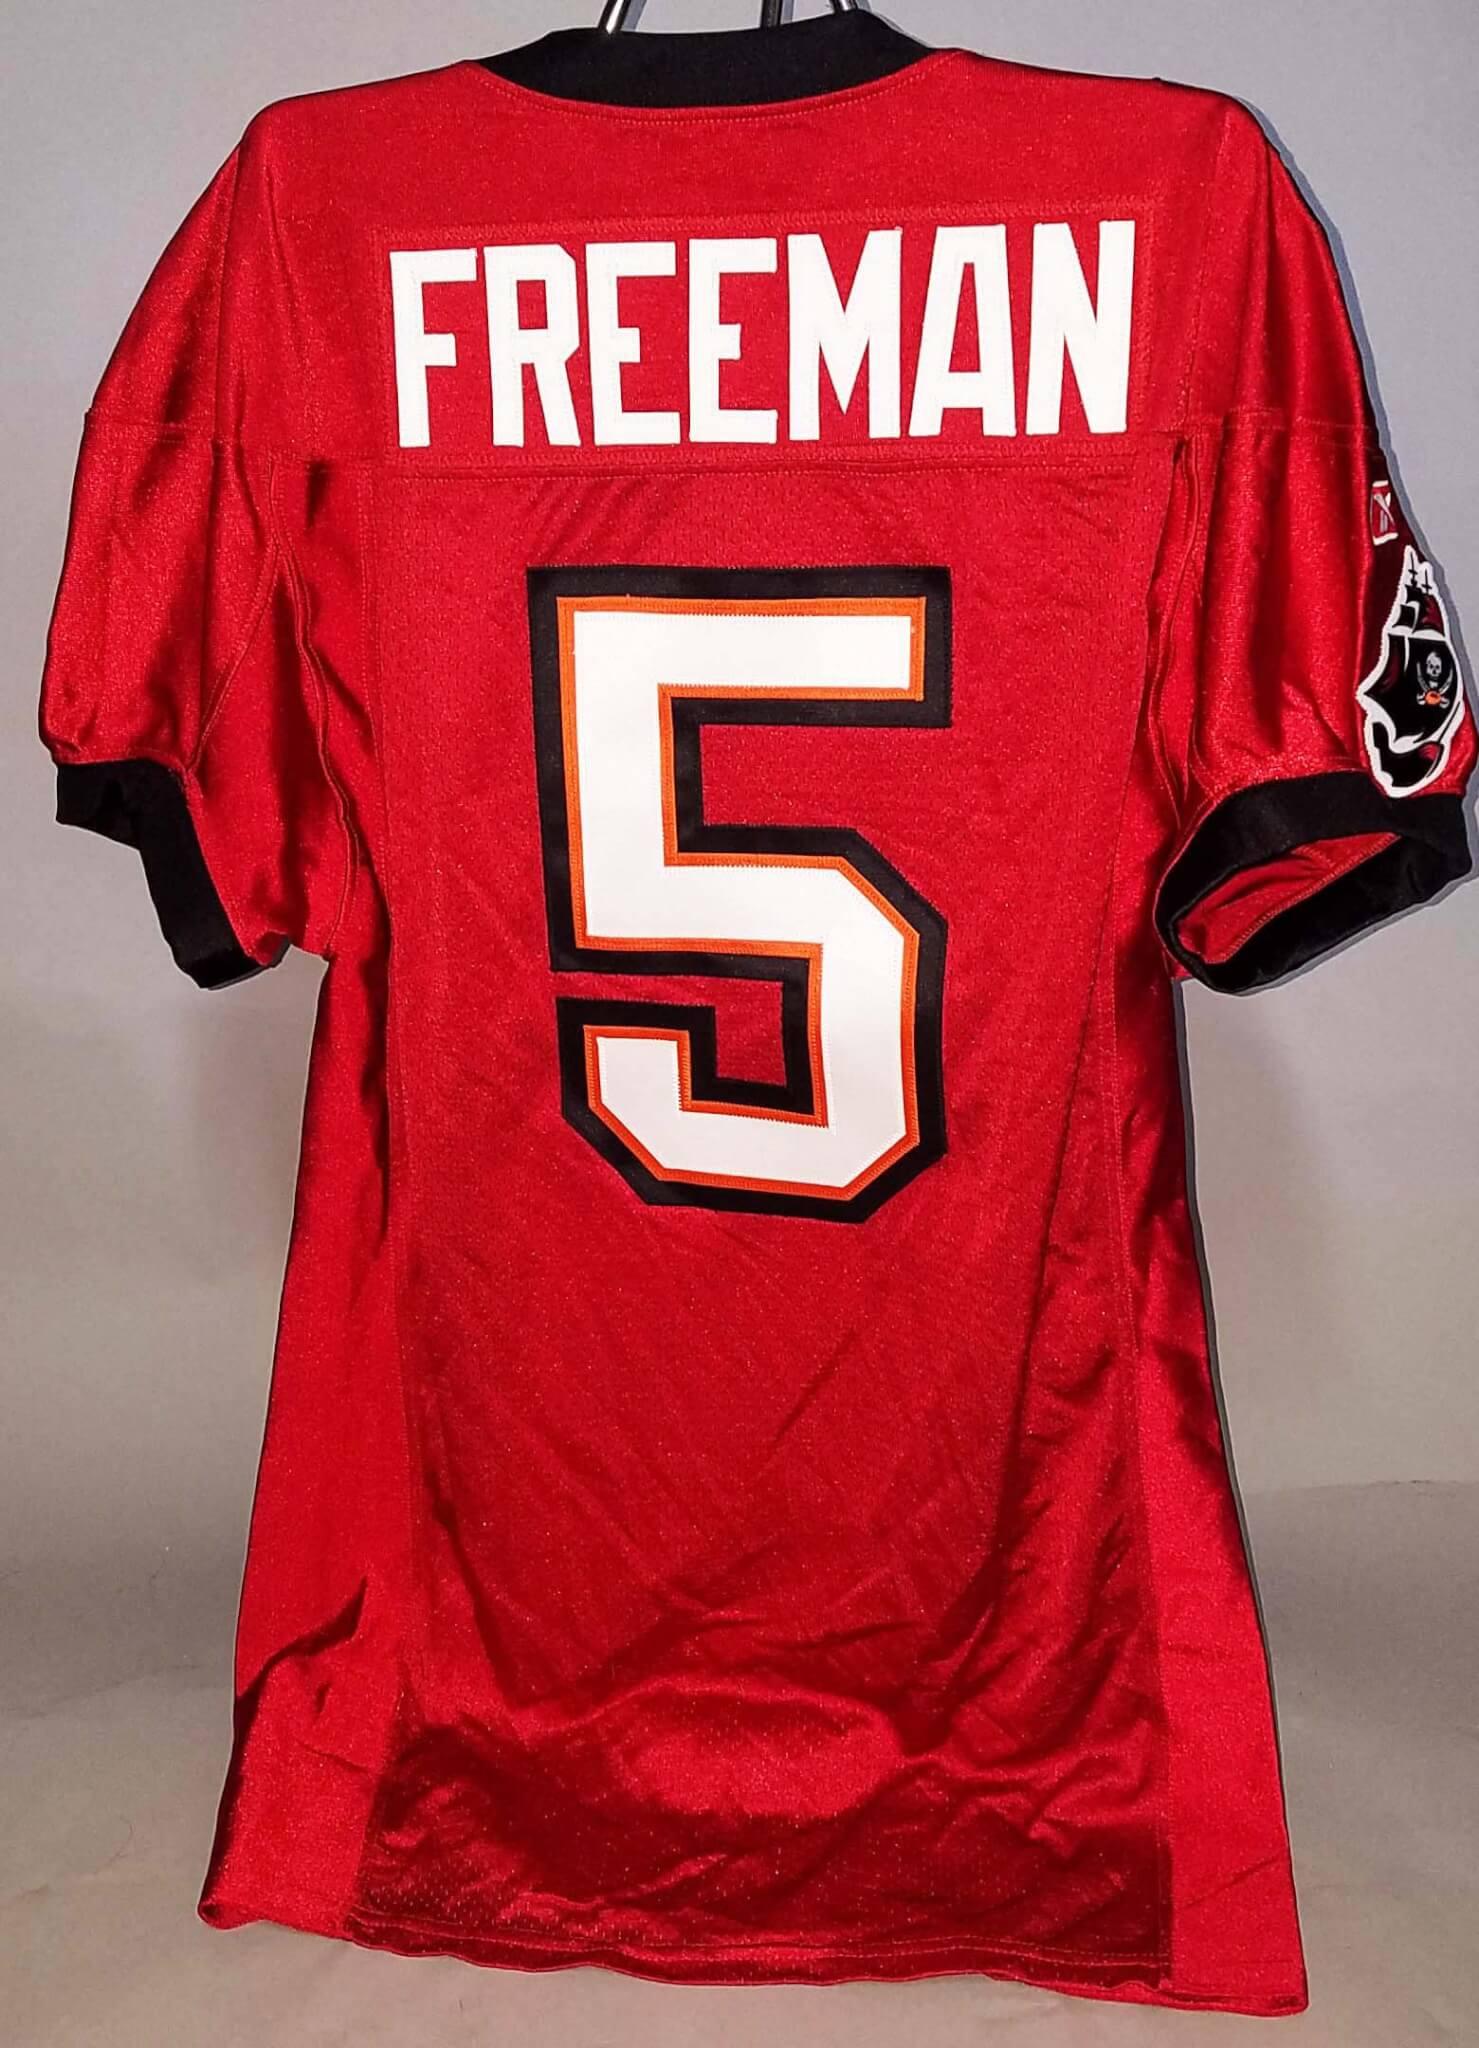 2011 Josh Freeman Game Worn Tampa Bay Buccaneers Jersey  hot sale